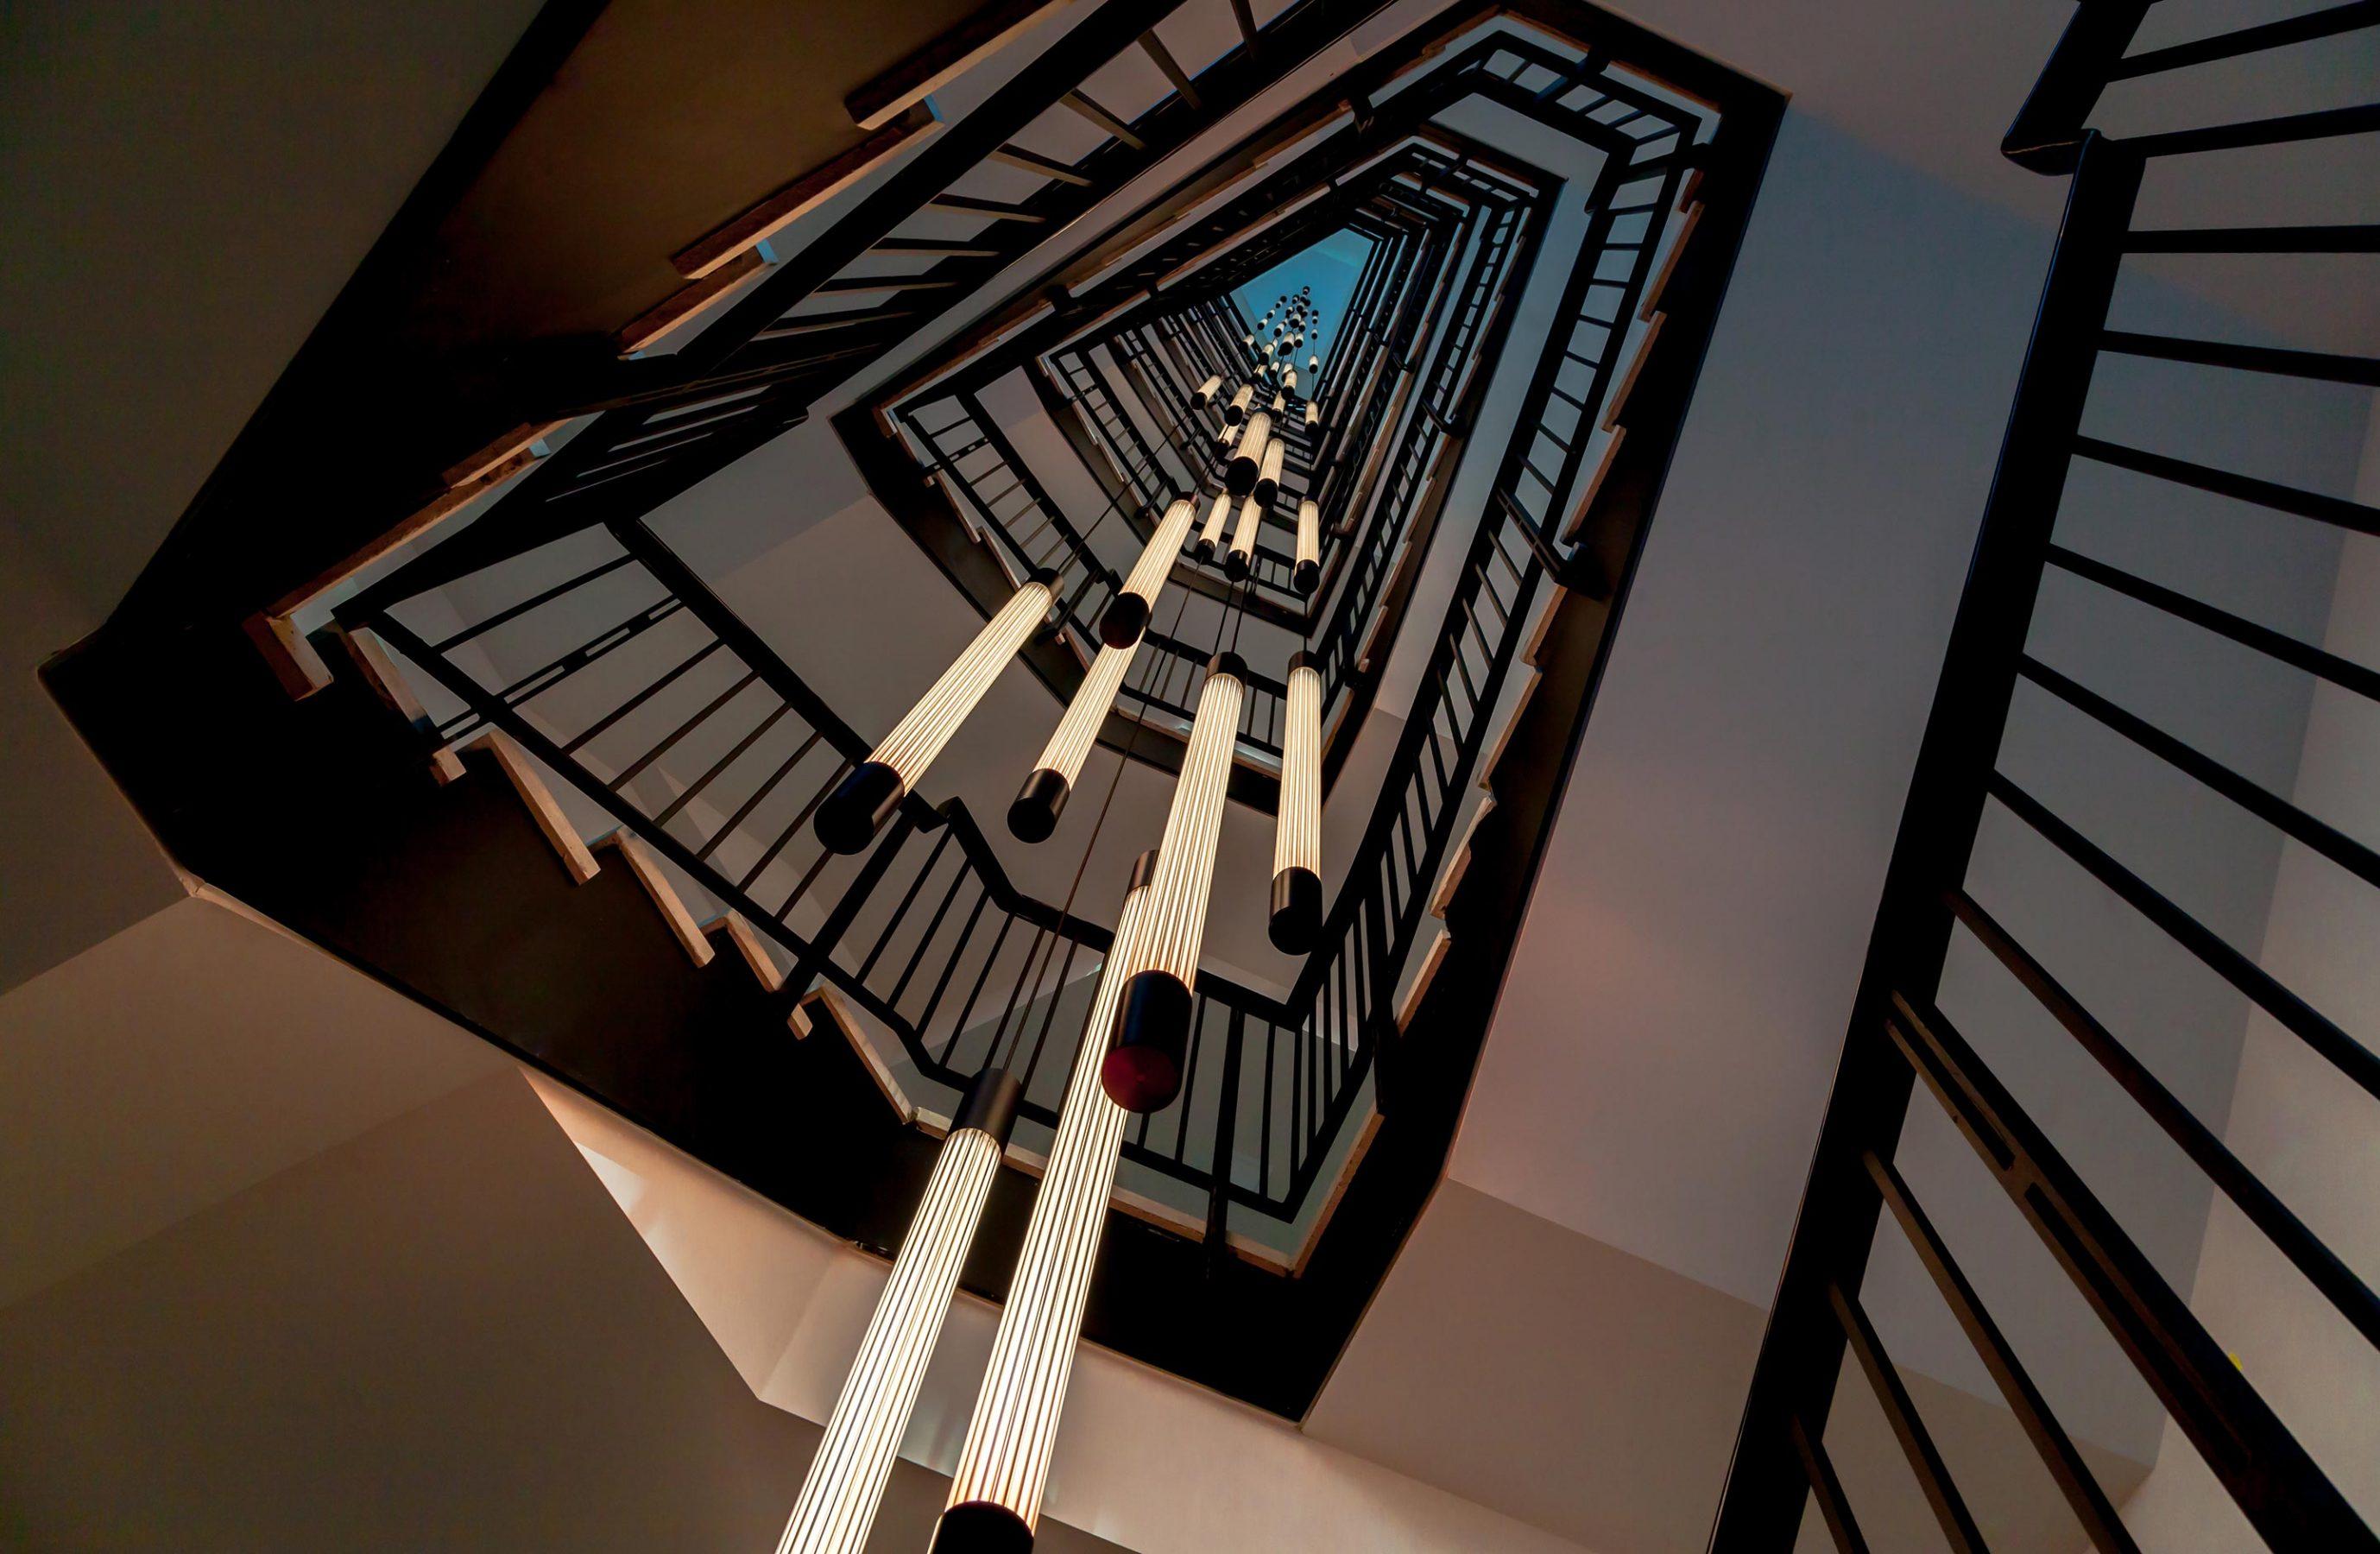 05-Bauhaus-haberdashery-w-slideshow